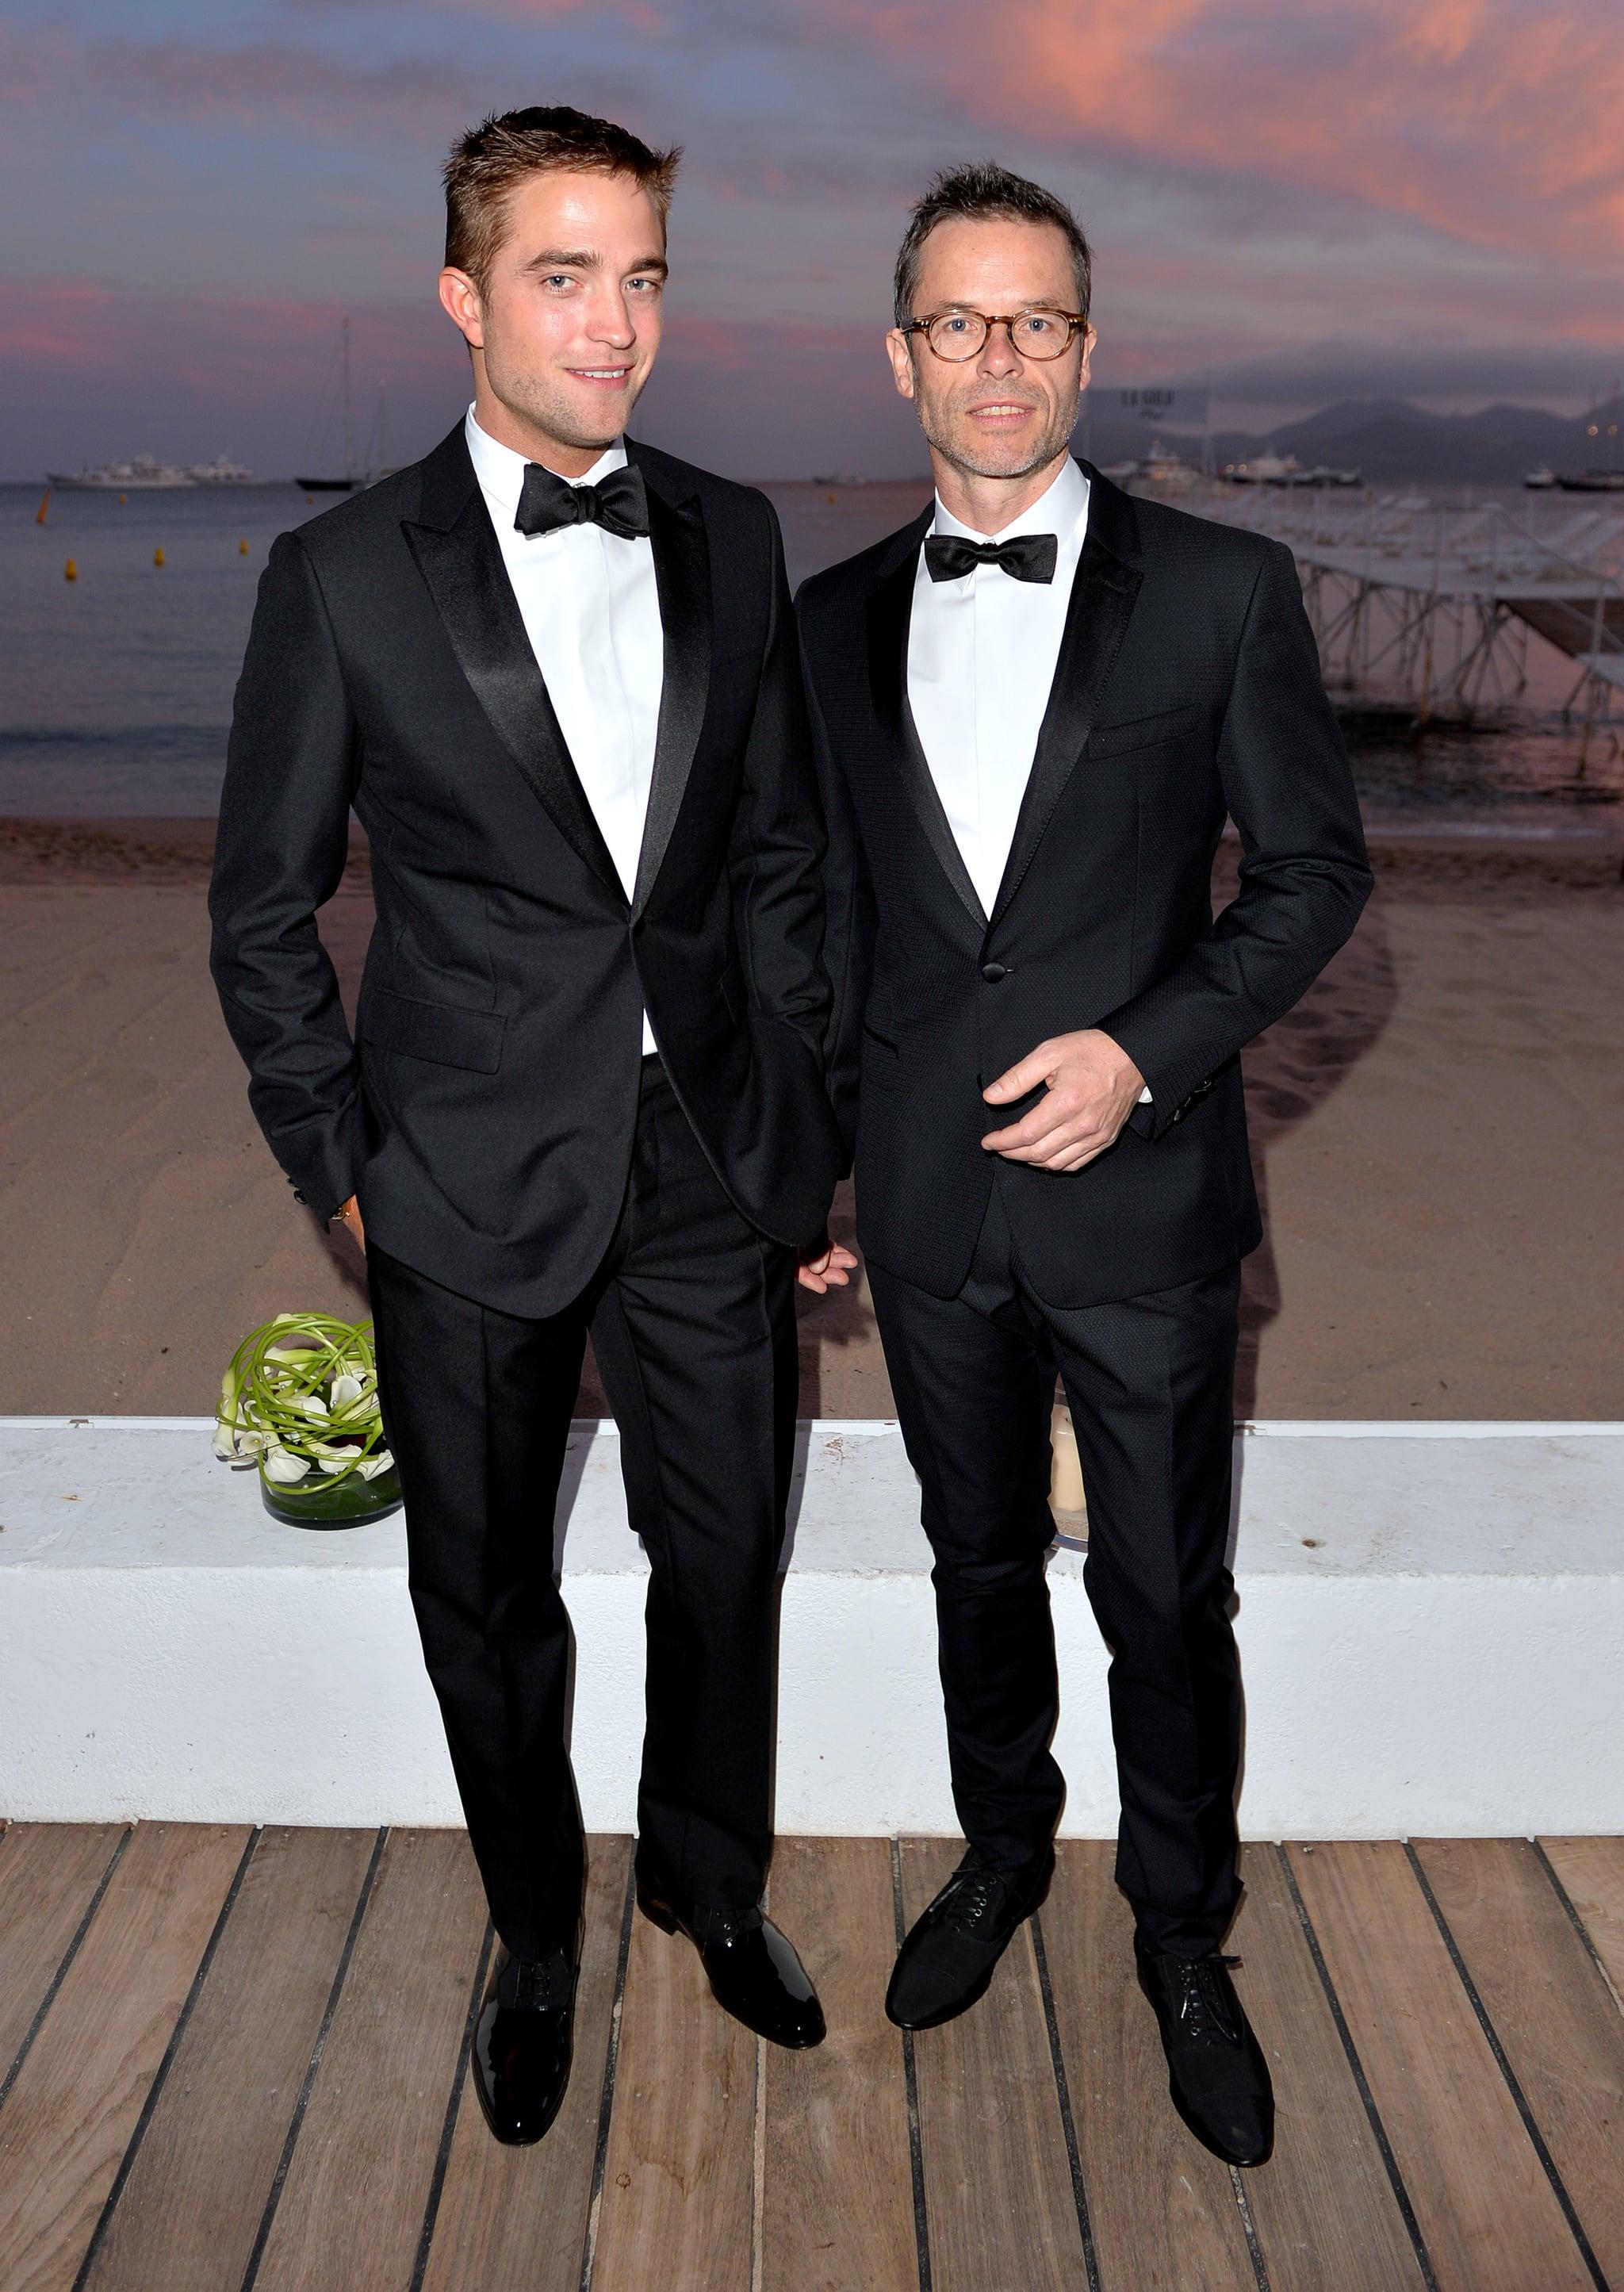 ¿Cuánto mide Christopher Walken? Robert-Pattinson-Guy-Pearce-Rover-Cocktail-Party